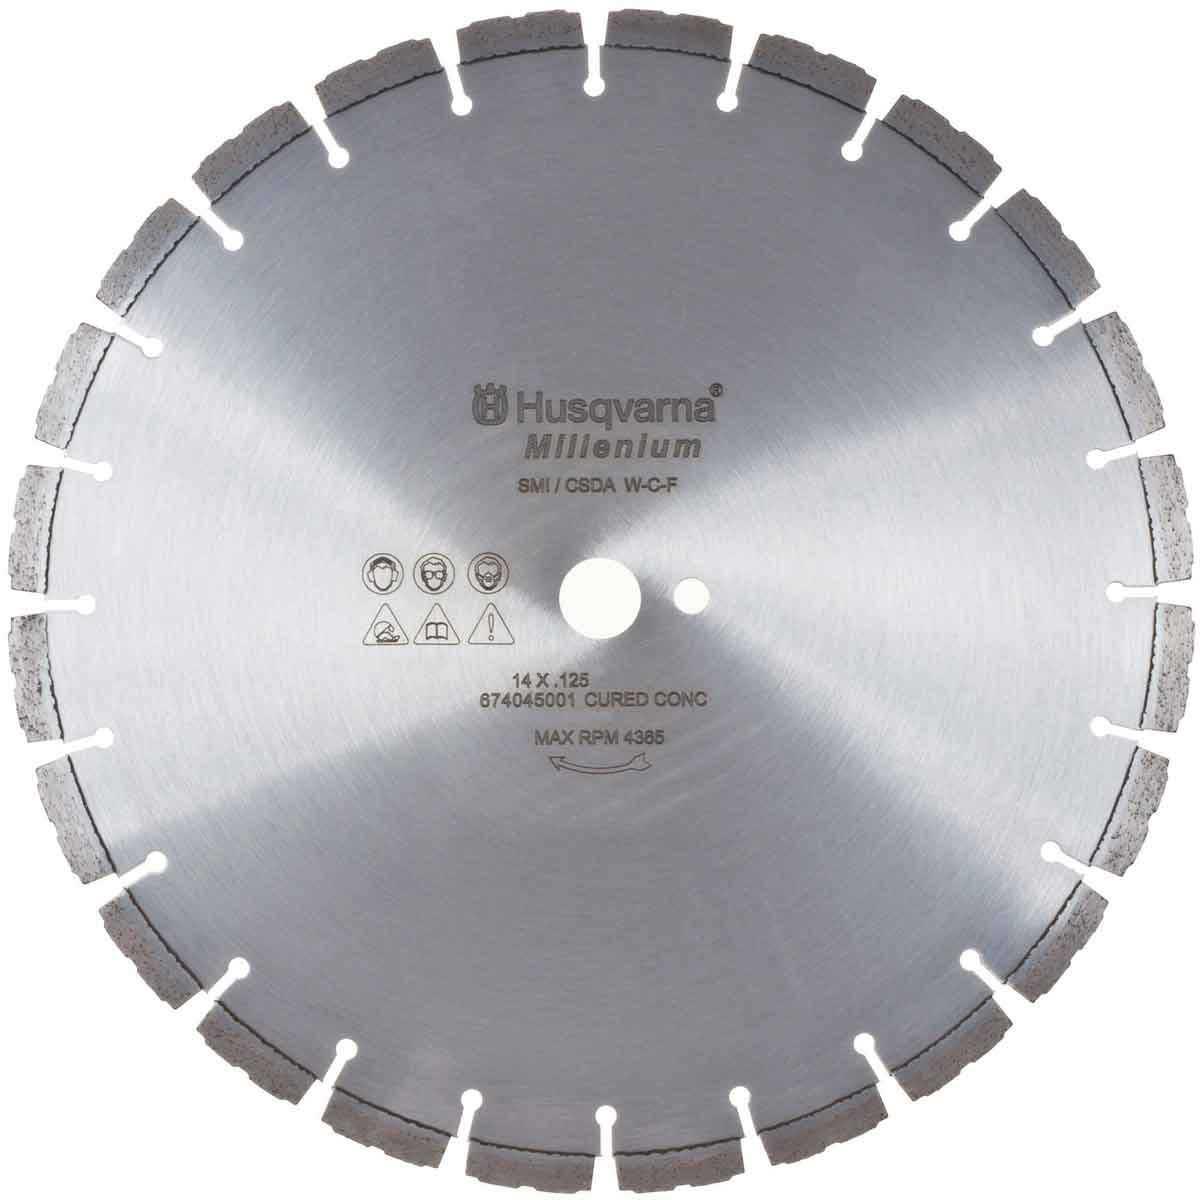 Husqvarna Millenium F710C Diamond Blades